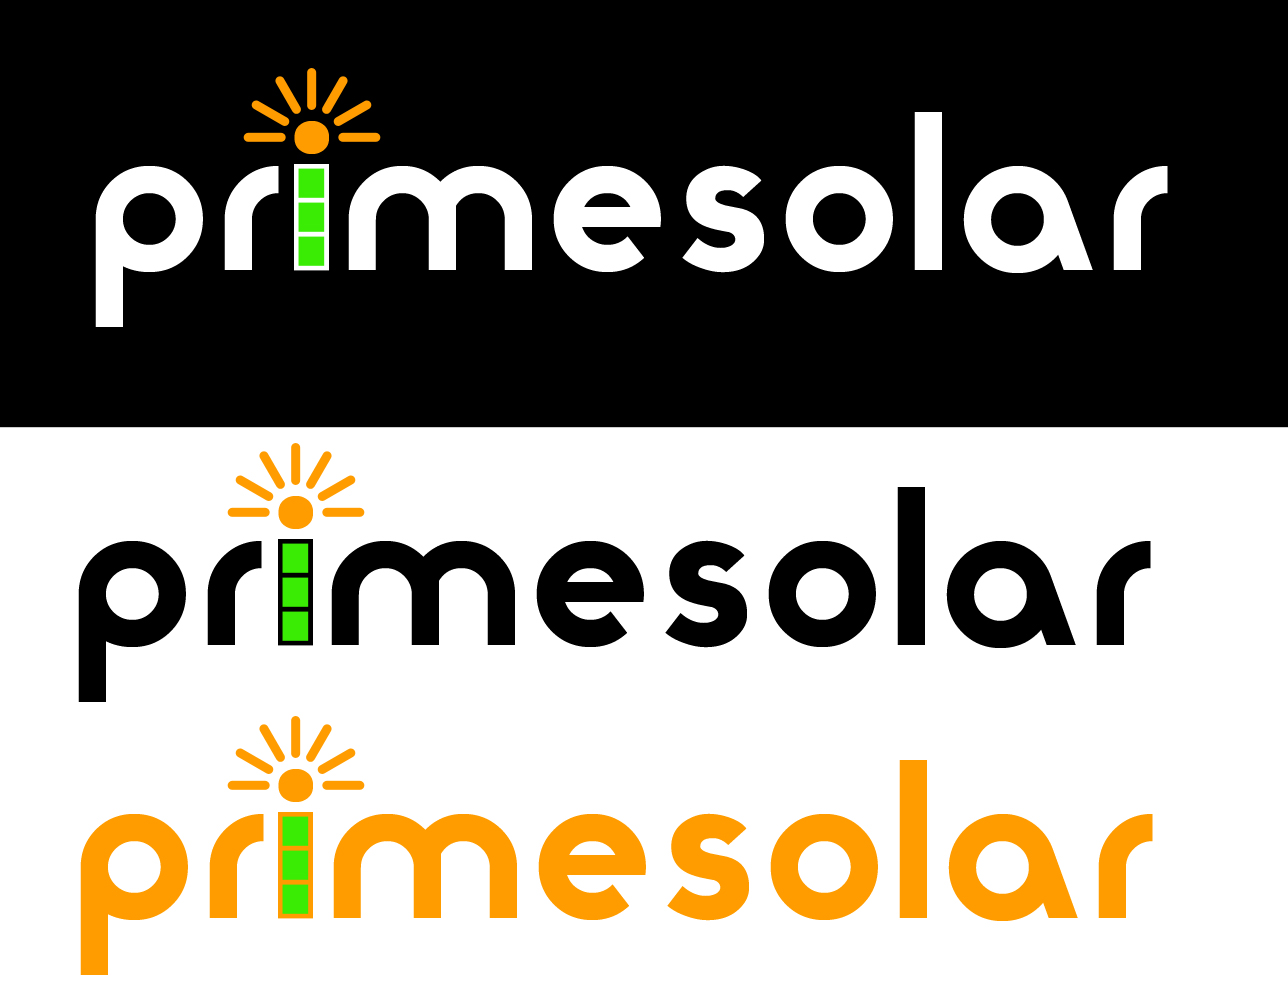 Логотип компании PrimeSolar [UPD: 16:45 15/12/11] фото f_4eea136d5da09.jpg